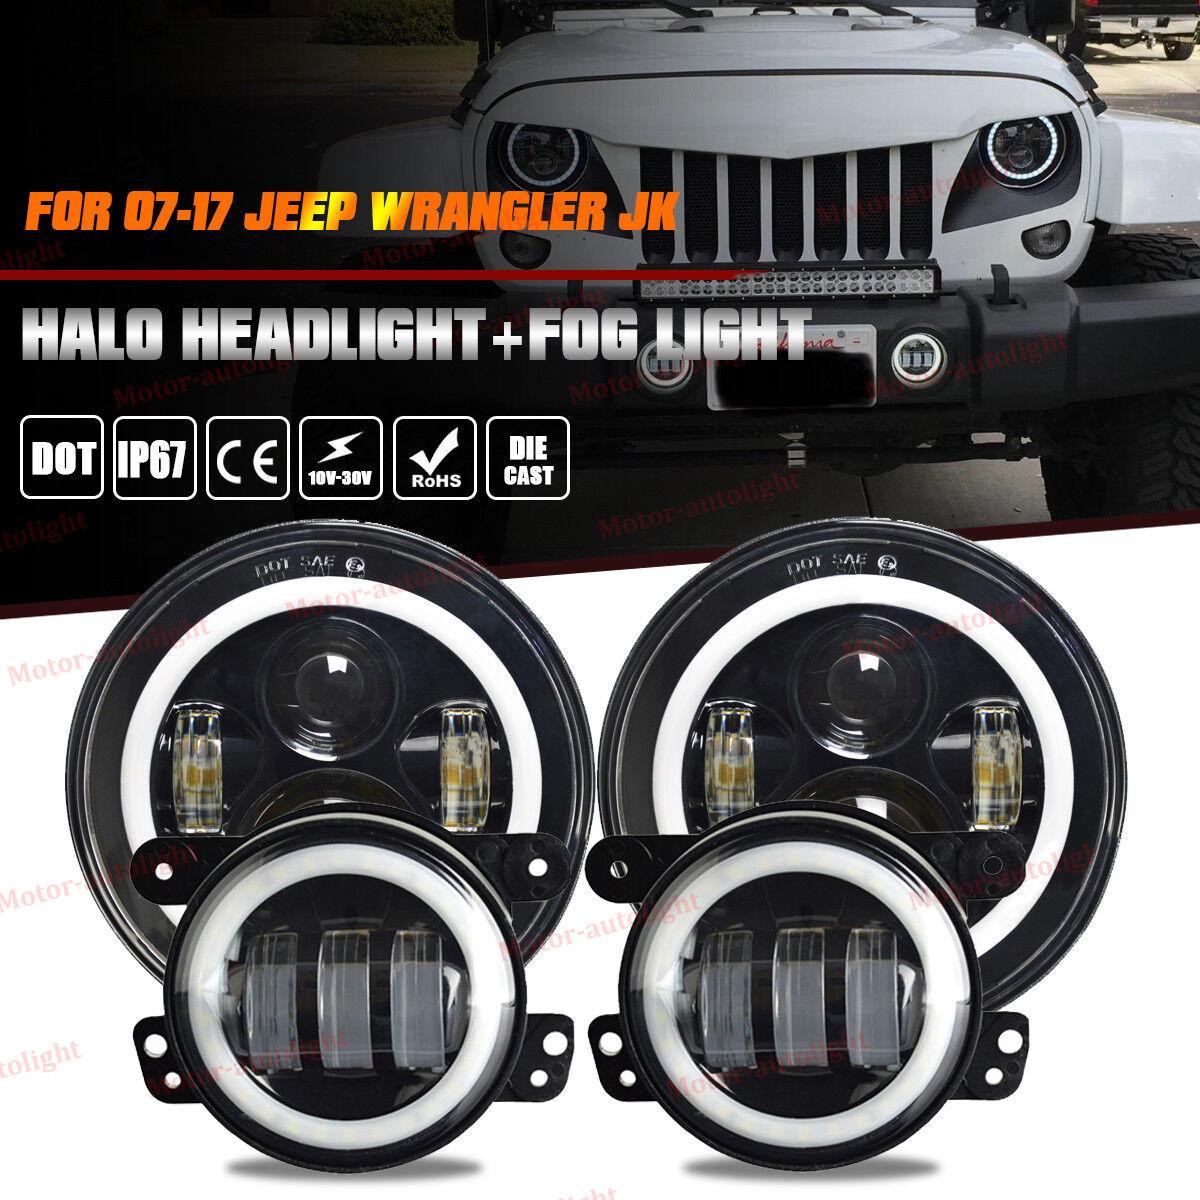 Jeep Halo Headlights >> Details About For Jeep Wrangler Jk 7 Led Halo Headlight Fog Lights Combo Kit 07 17 Light Bulb